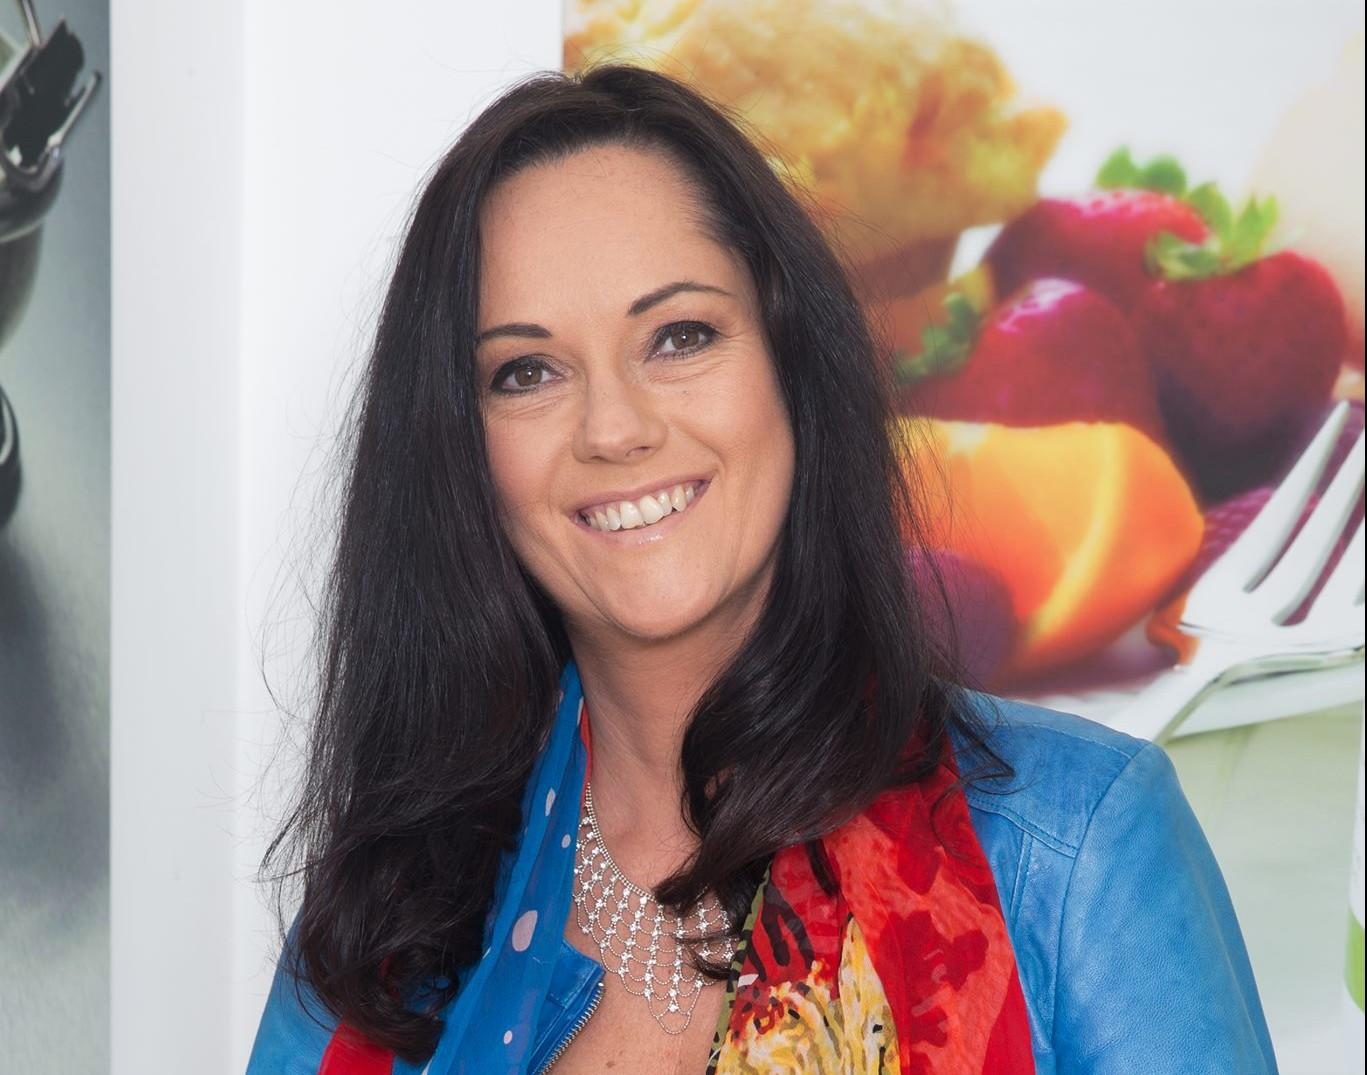 Sonja Lichtner